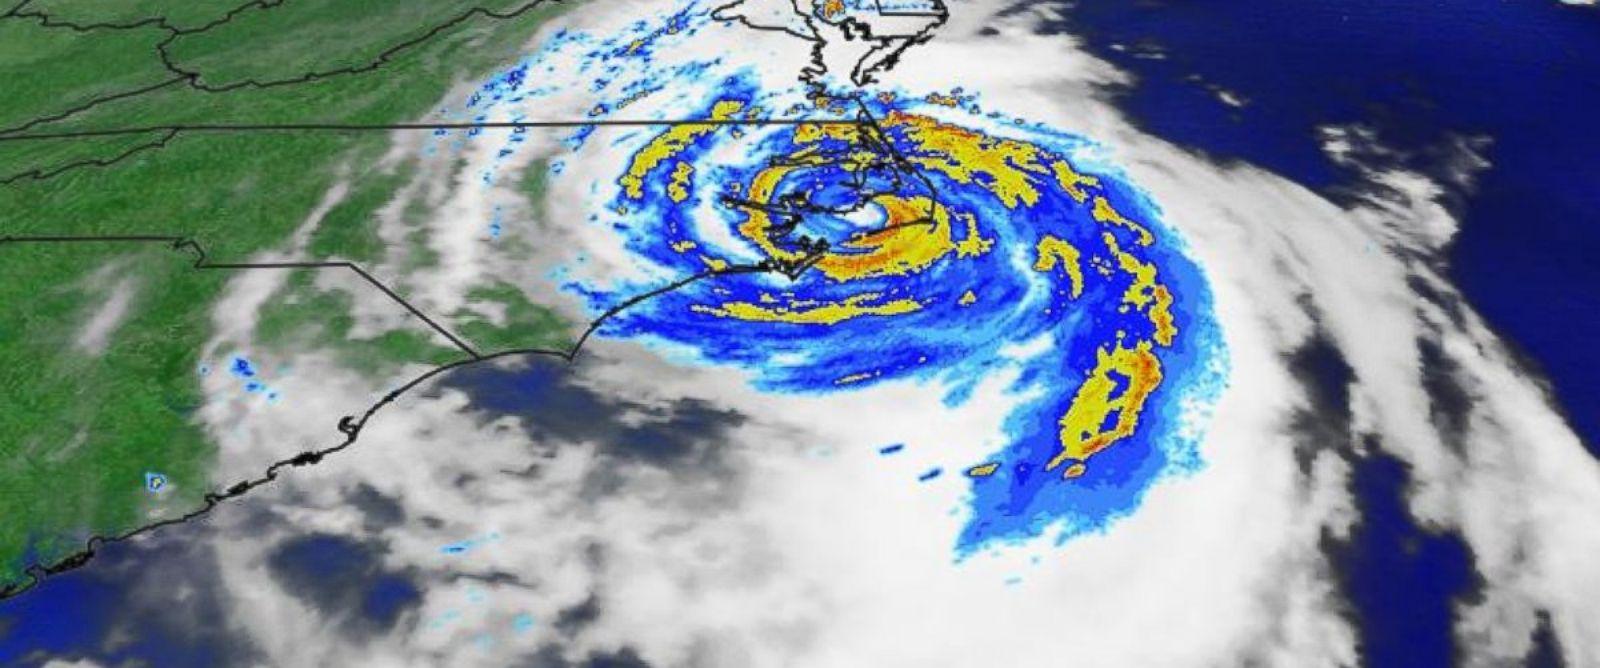 PHOTO: The eye of Hurricane Arthur made landfall at 11:15 p.m. on July 3, 2014 at Cape Lookout, North Carolina.